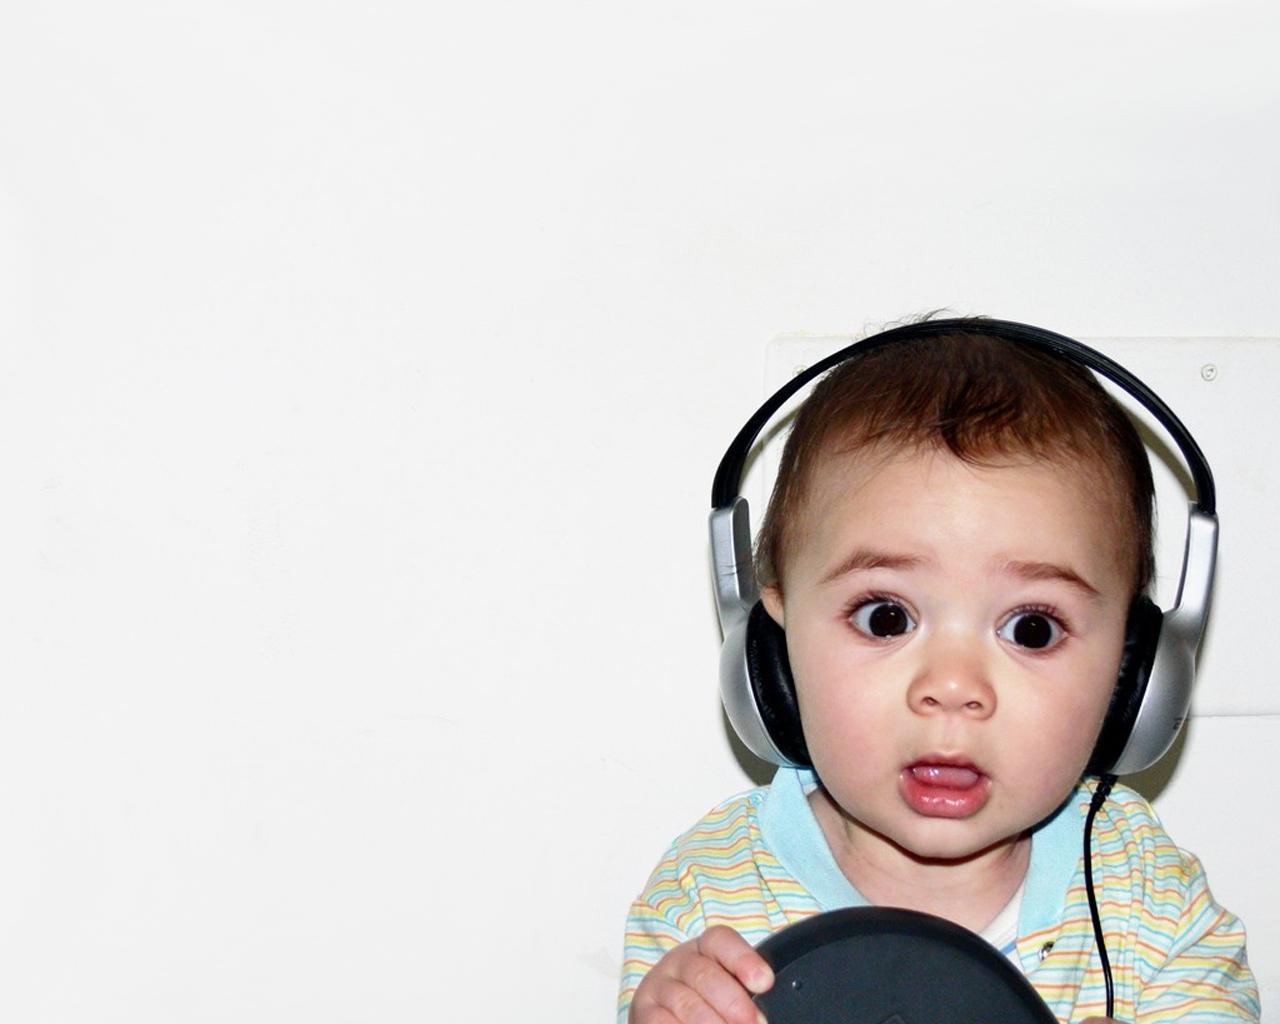 974 descargar fondo de pantalla Música, Personas, Niños: protectores de pantalla e imágenes gratis